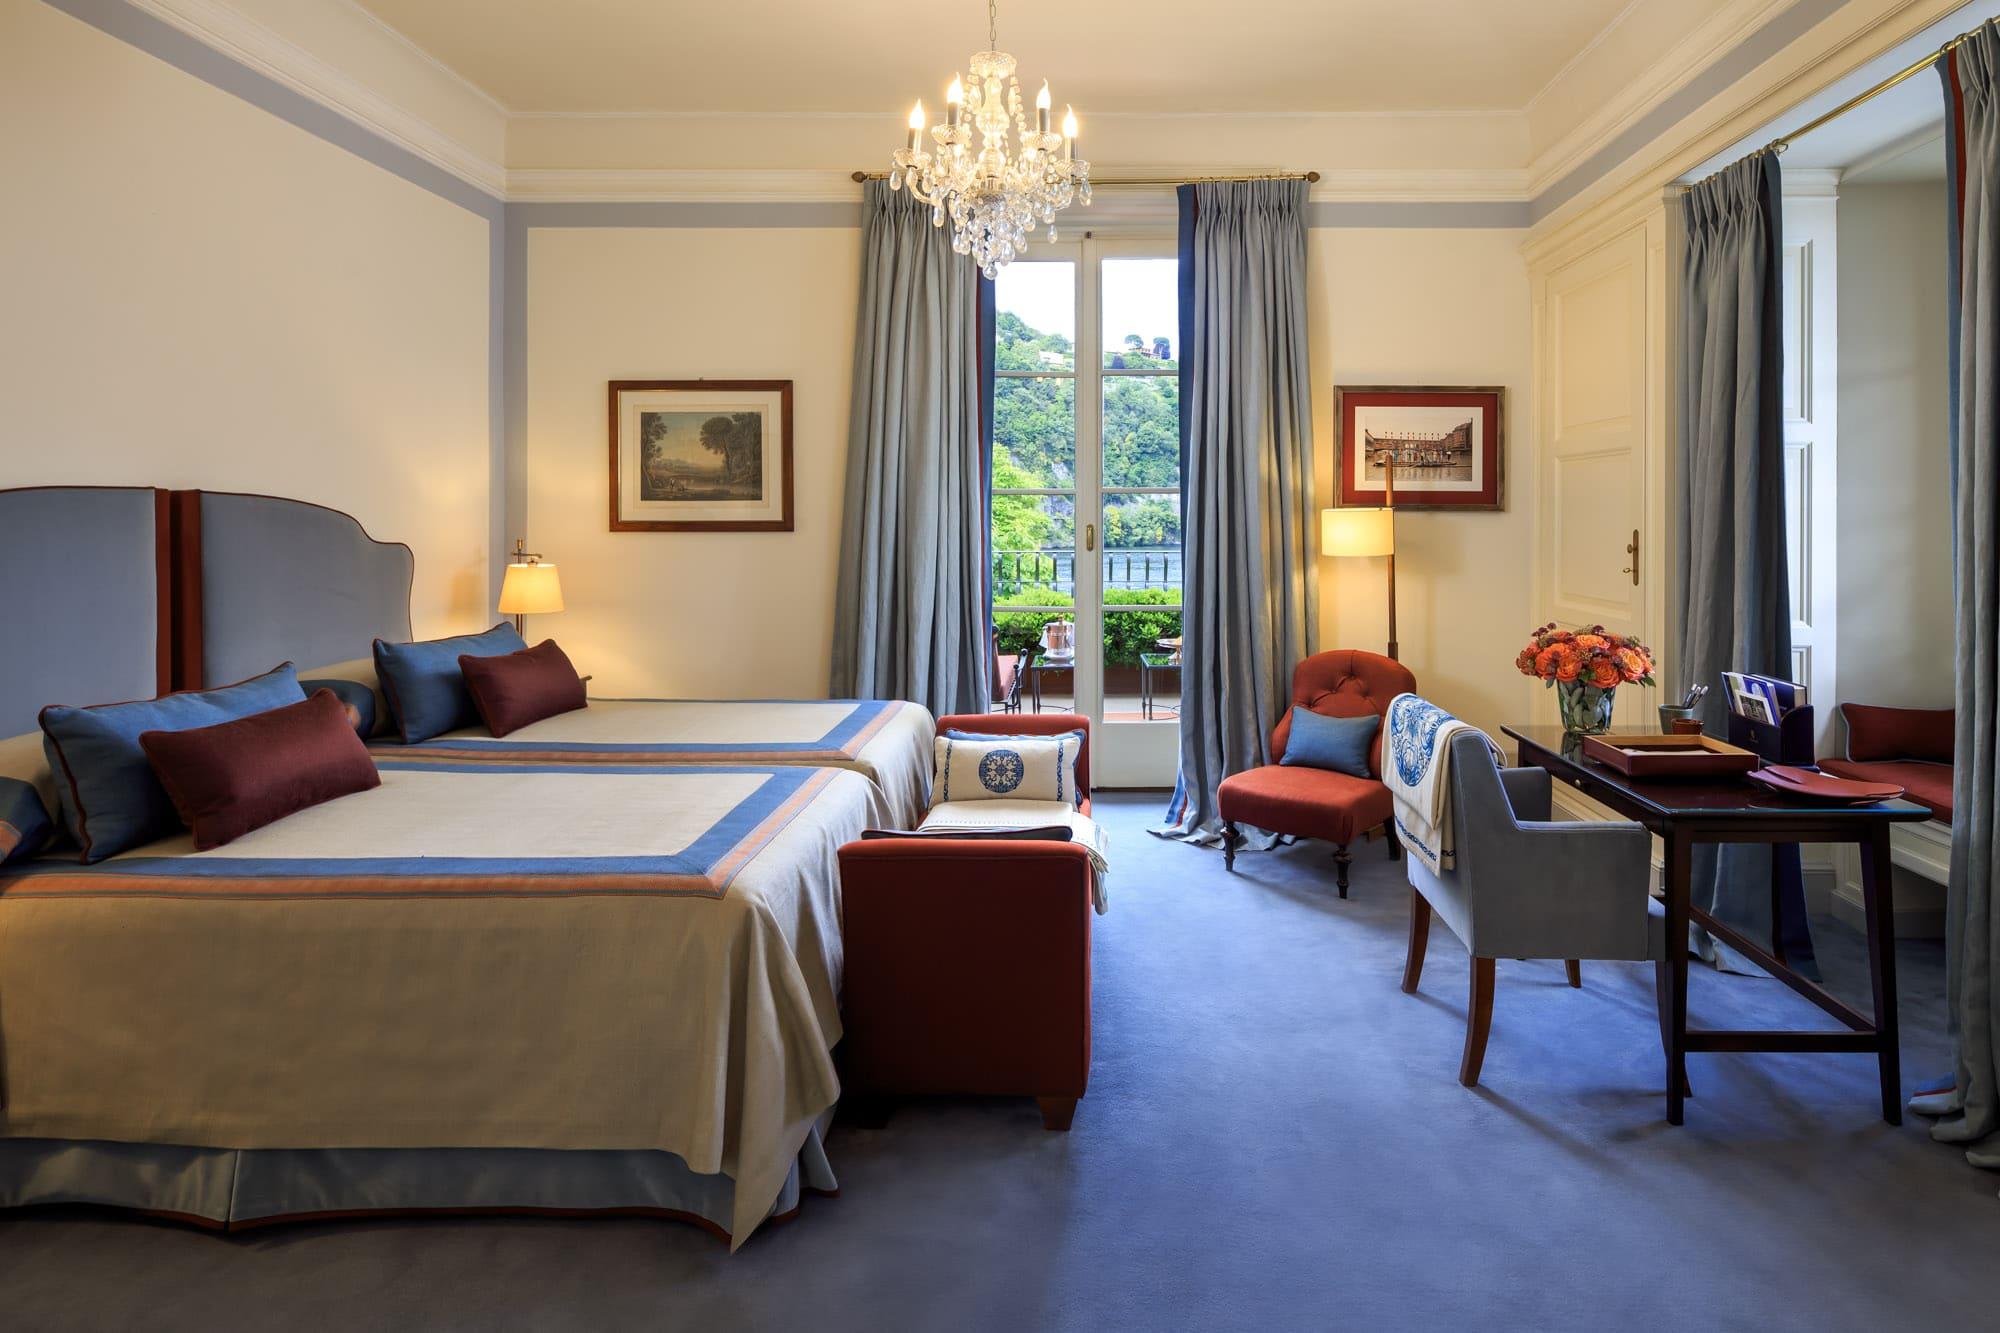 Villa Cima - First floor - Double Room